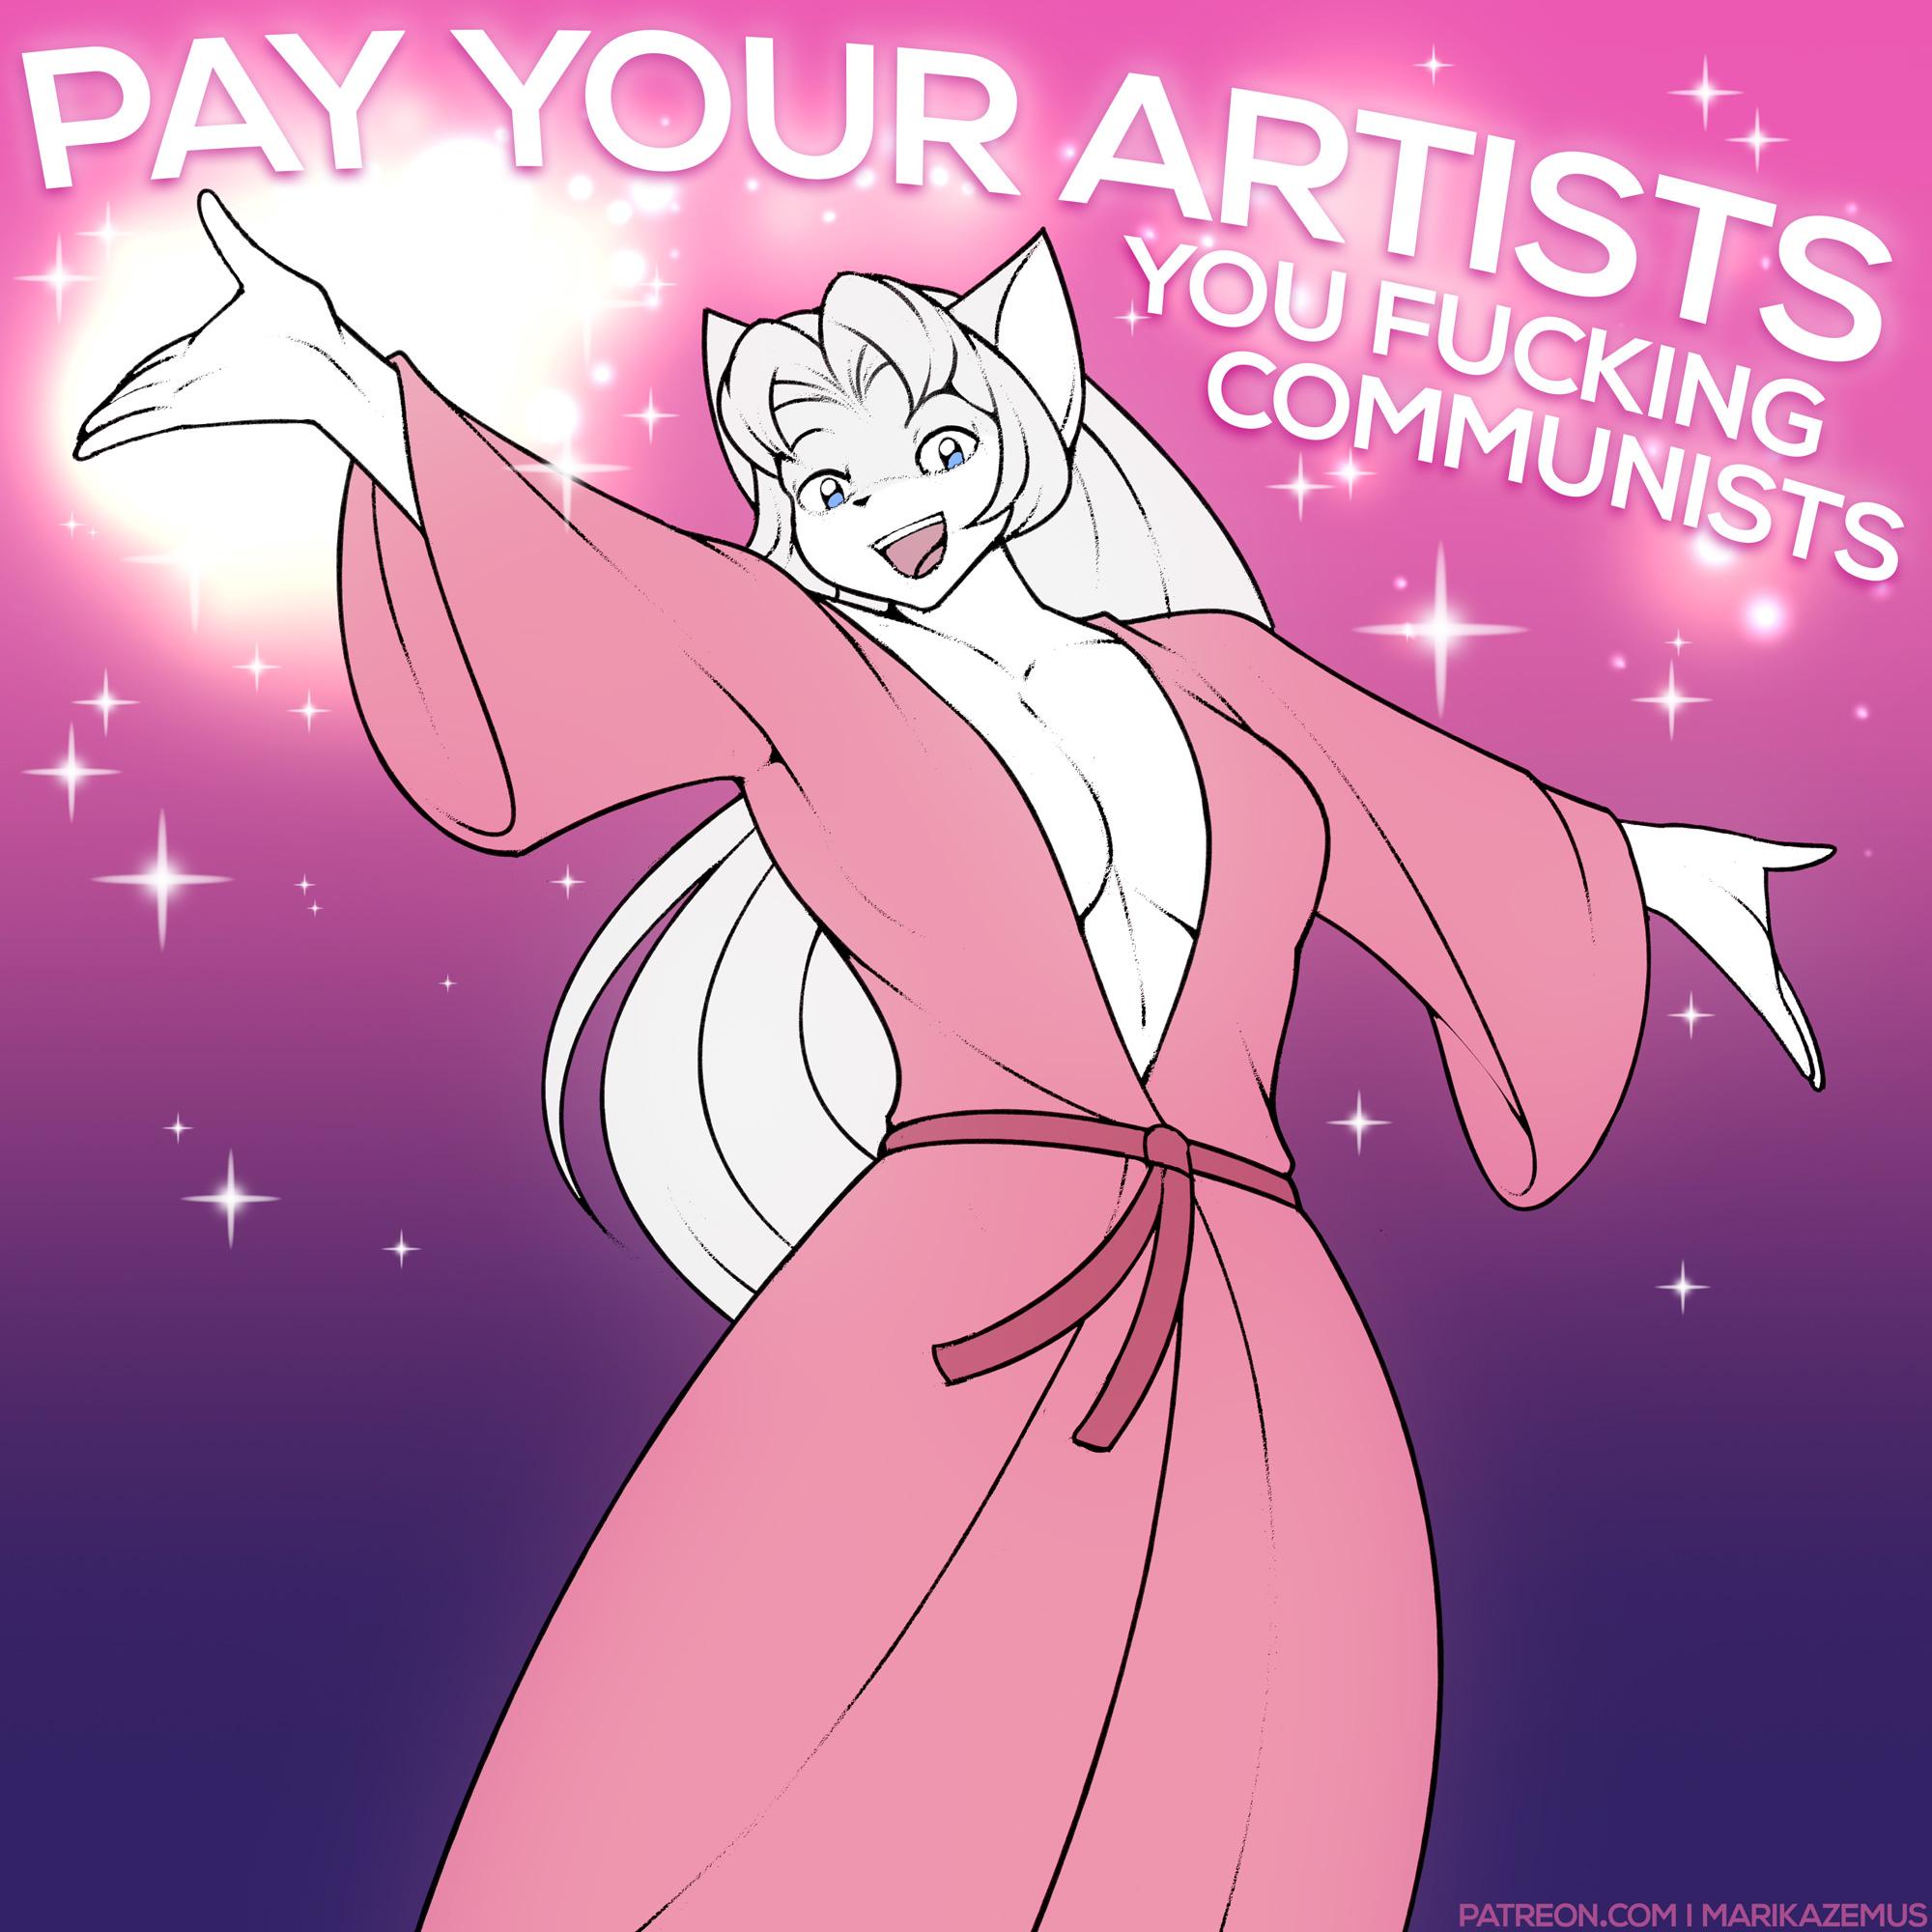 Karma - Pay Your Artists